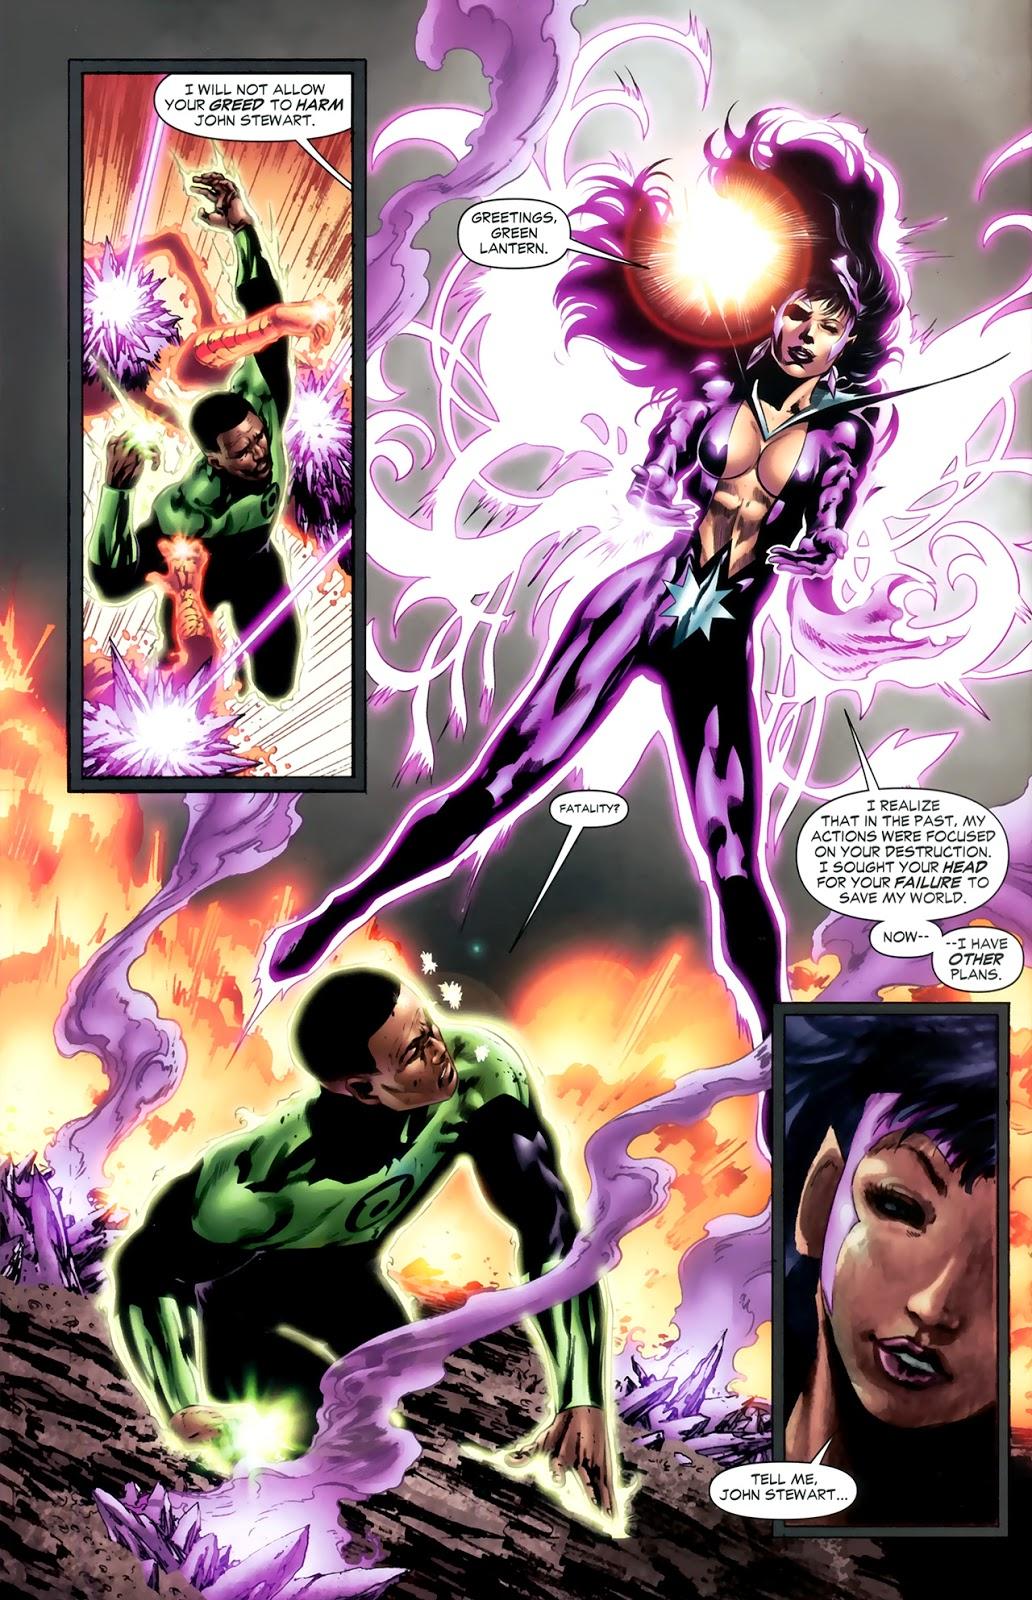 Star Sapphire Fatality (Green Lantern Vol. 4 #41)